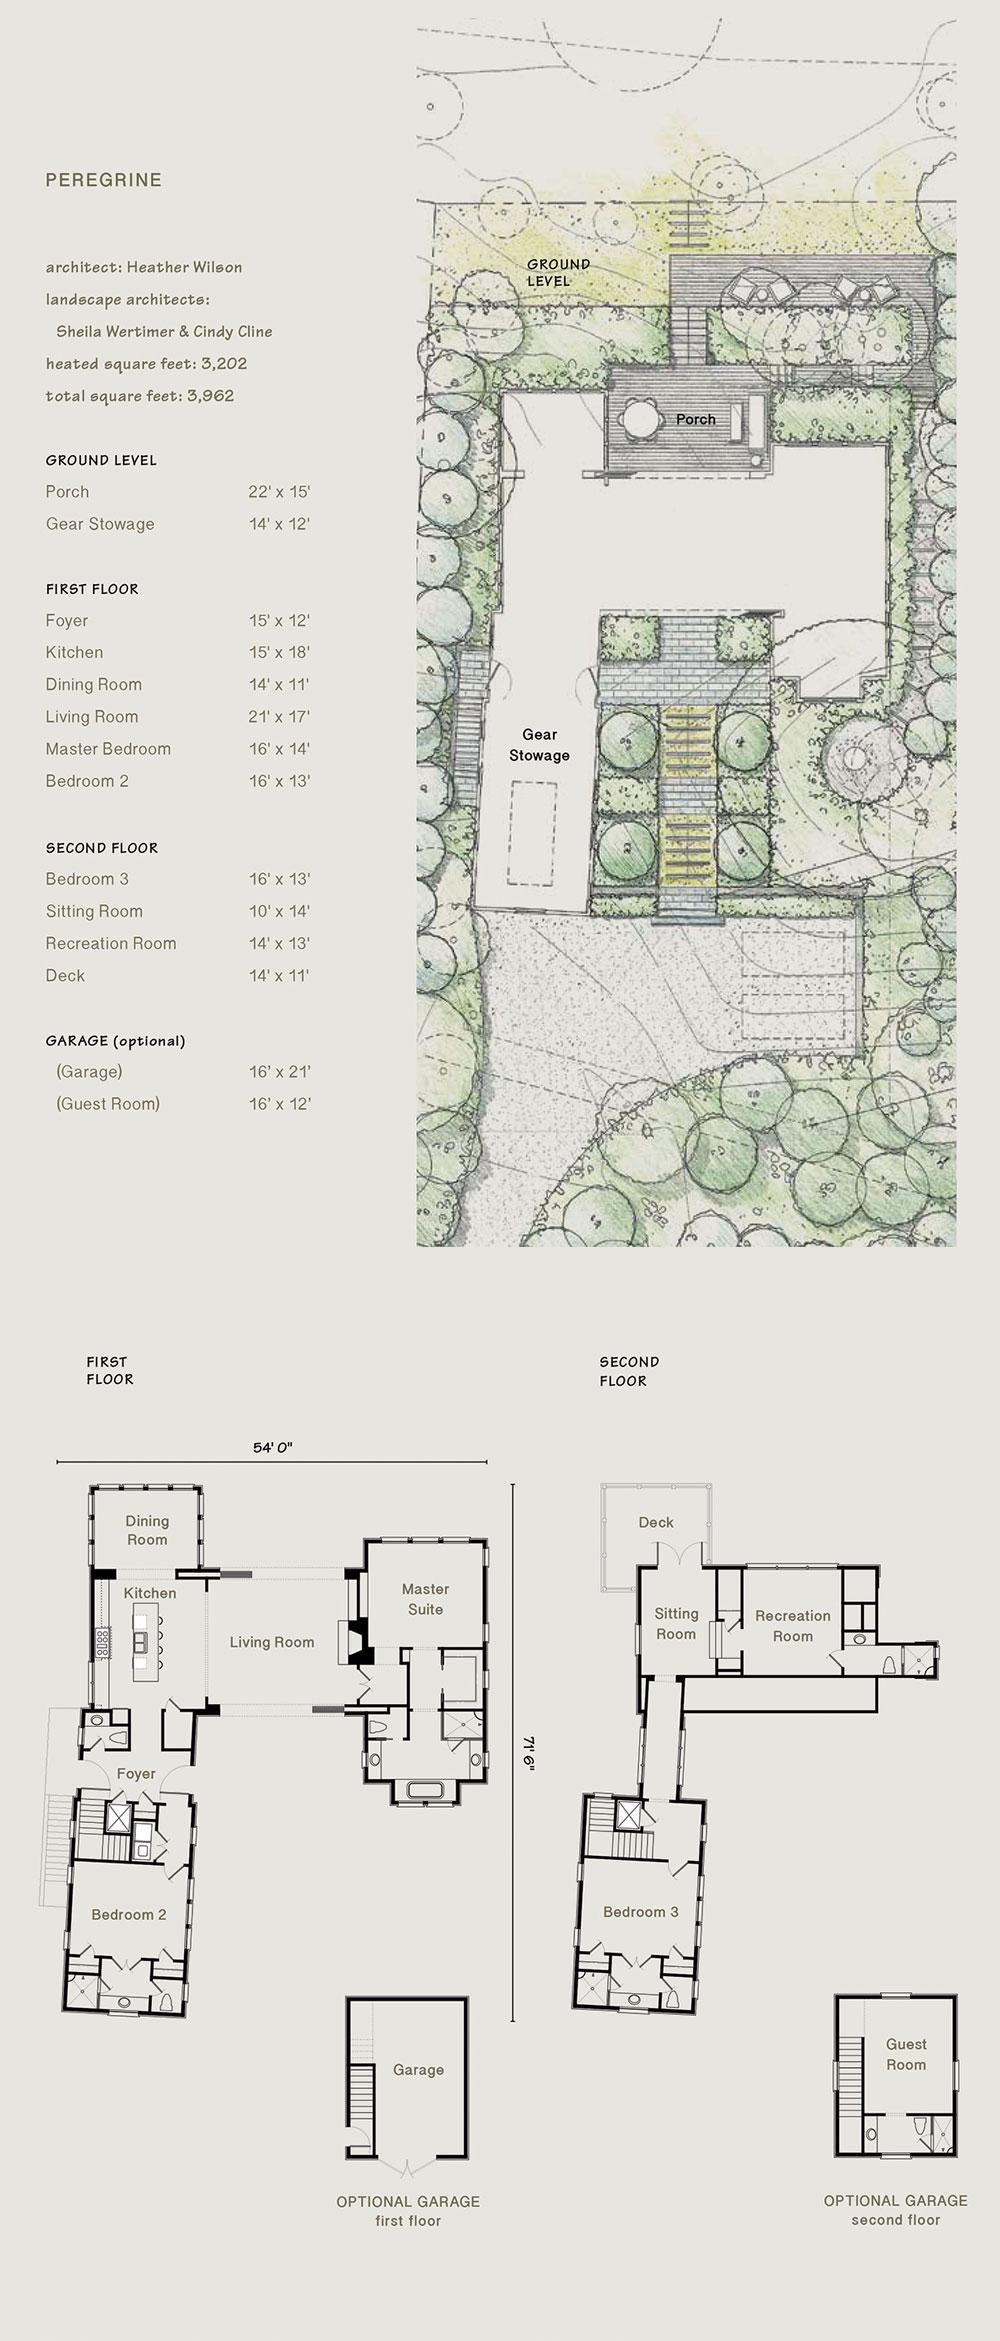 Peregrine Floor Plan